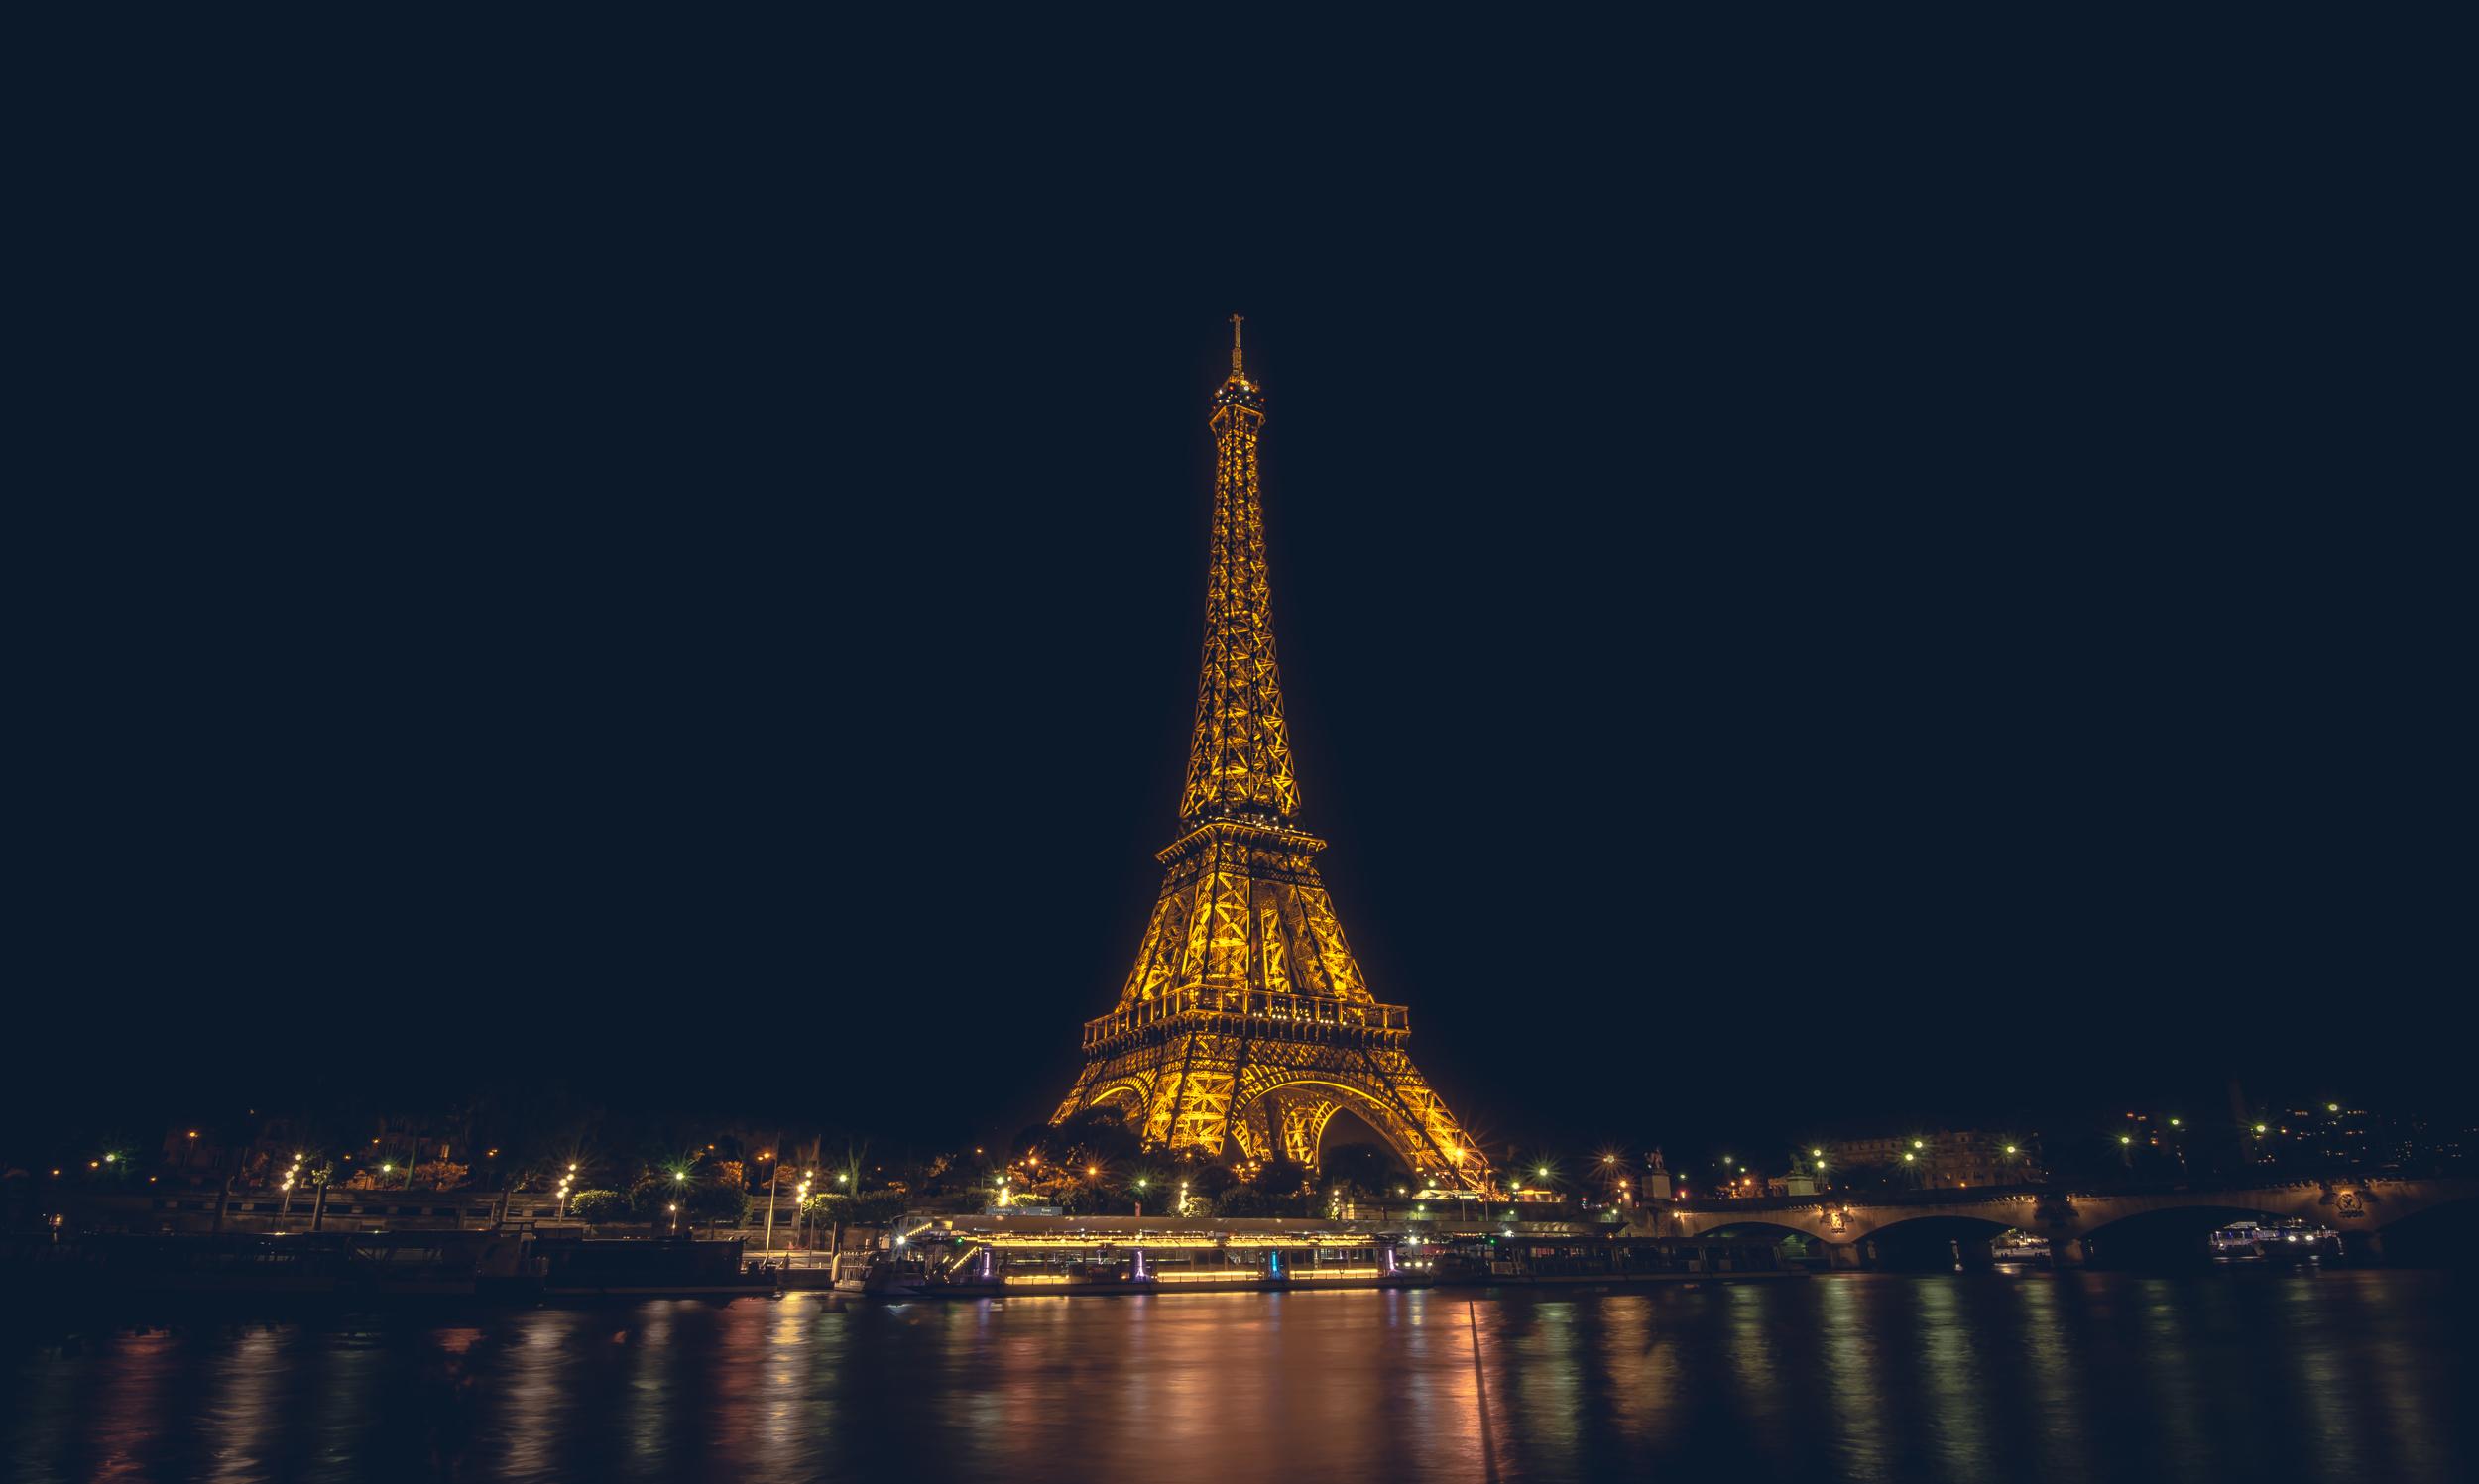 MAKMEDIA - PARIS